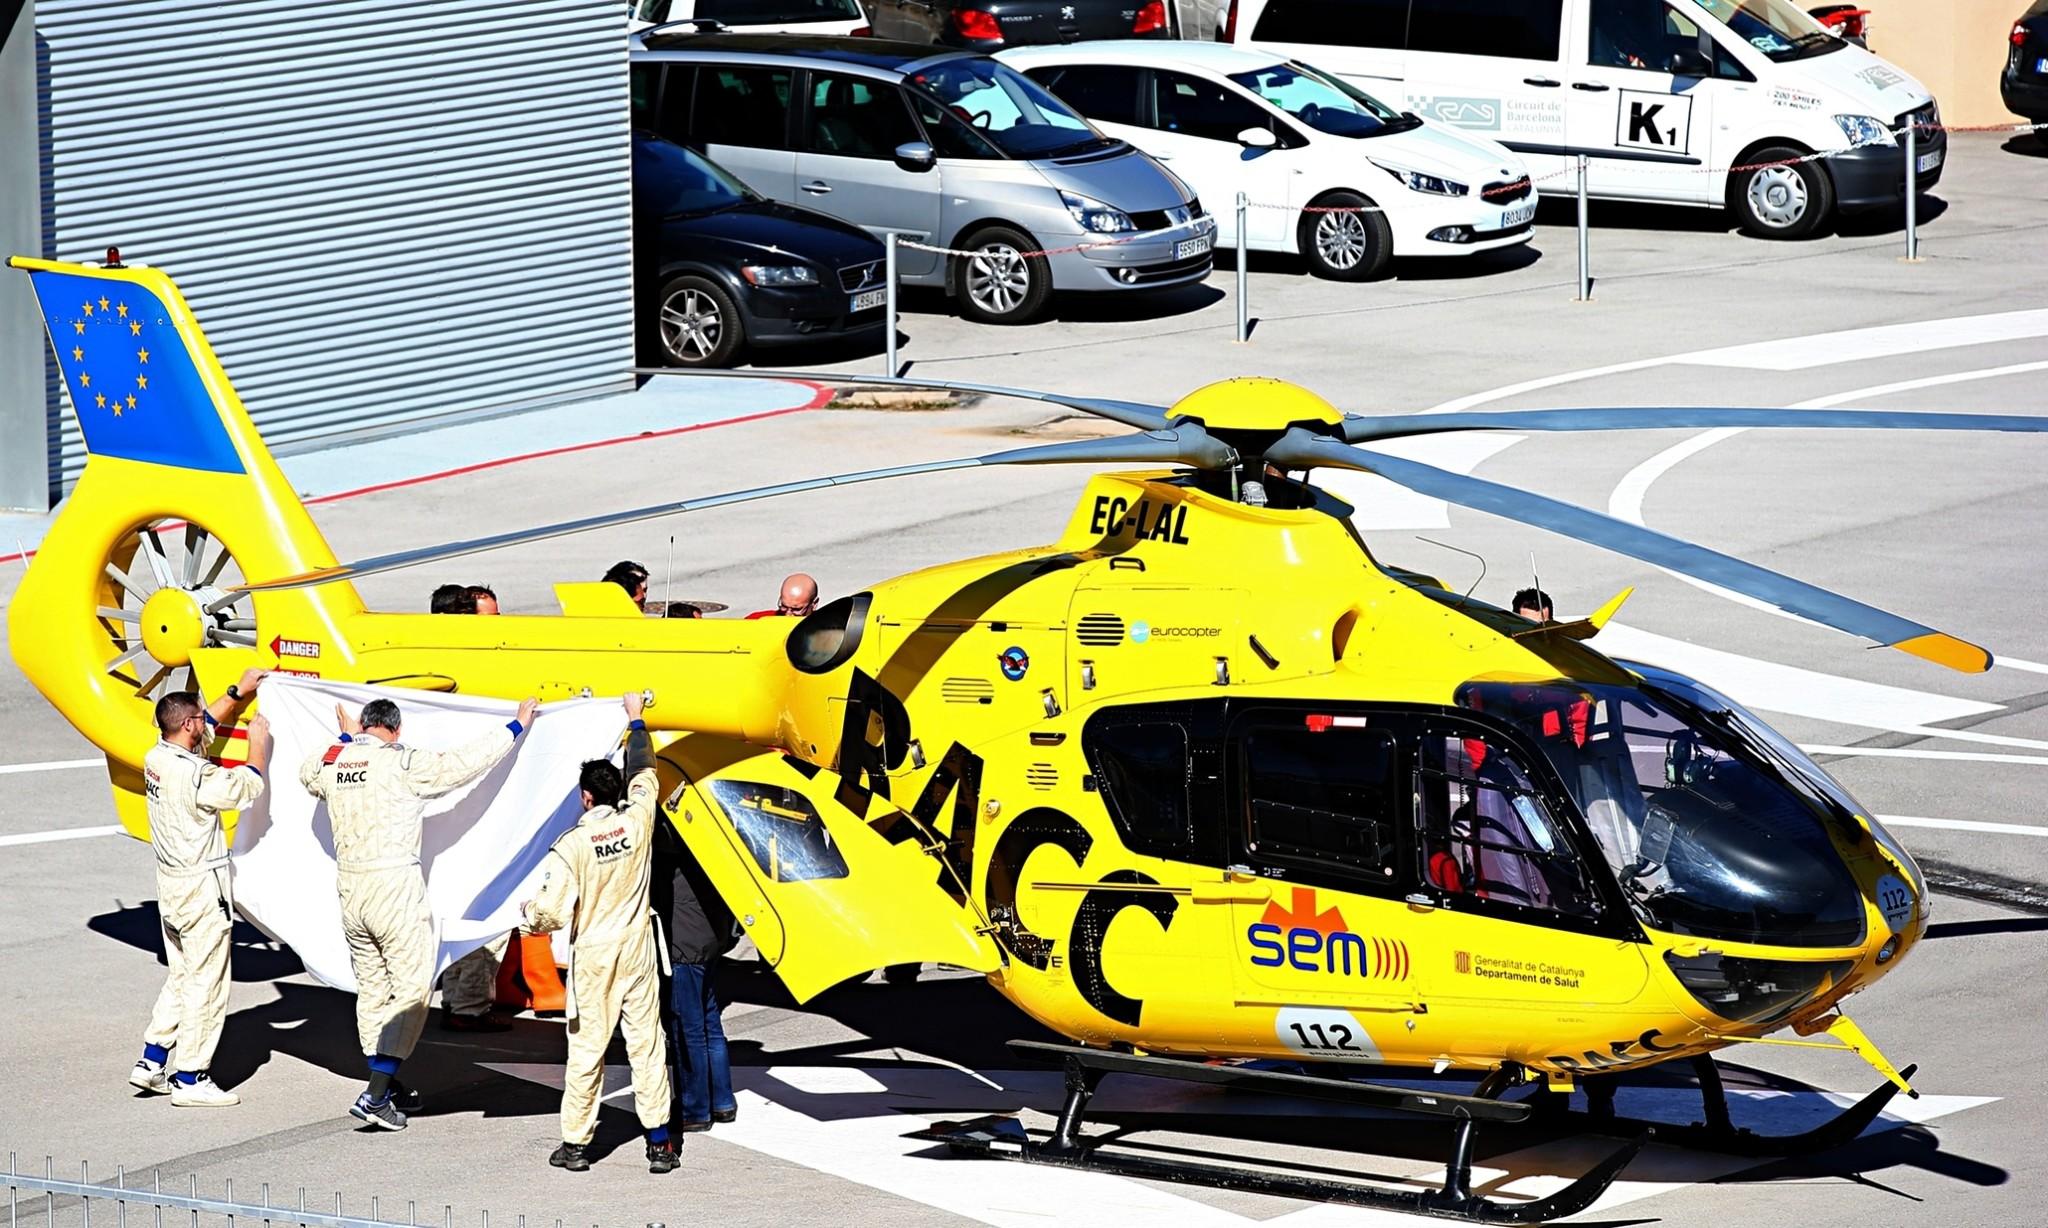 McLaren's Fernando Alonso flown to hospital after crash in F1 testing